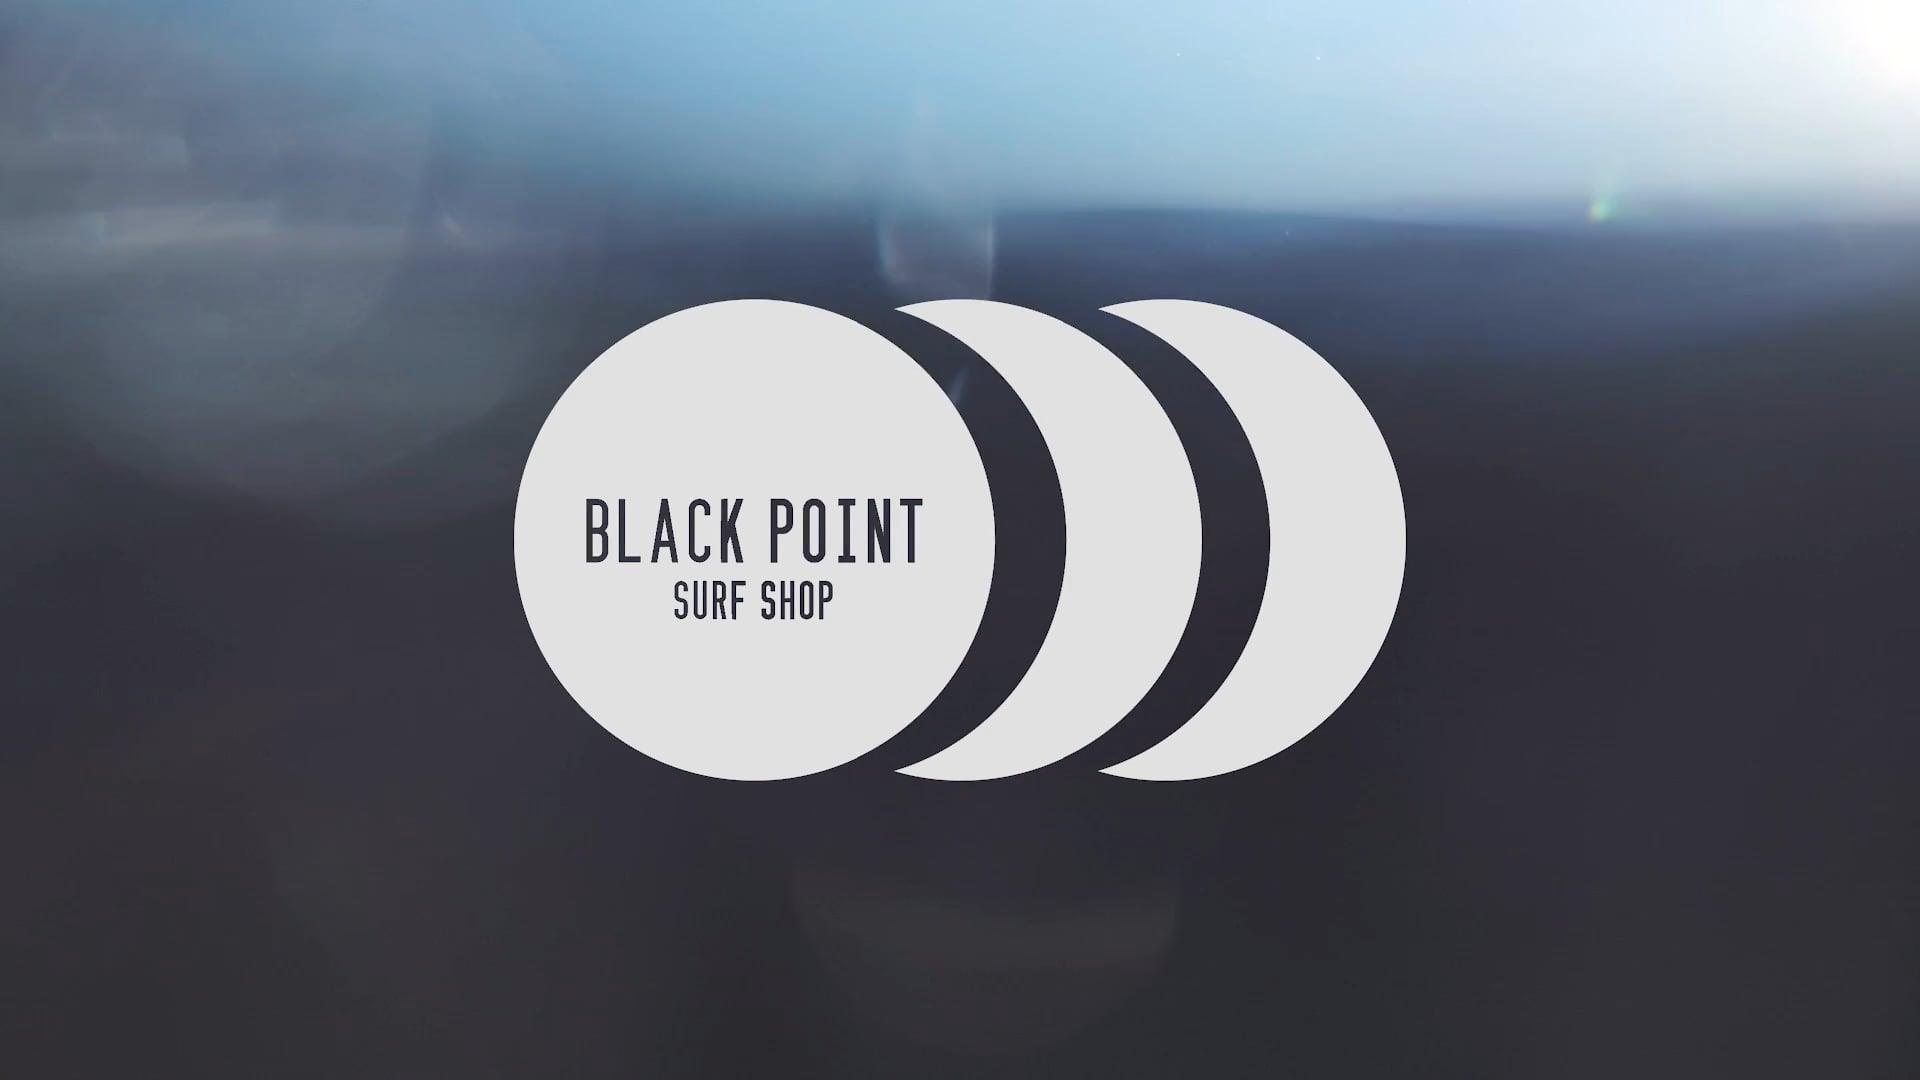 Blackpoint Surf Shop